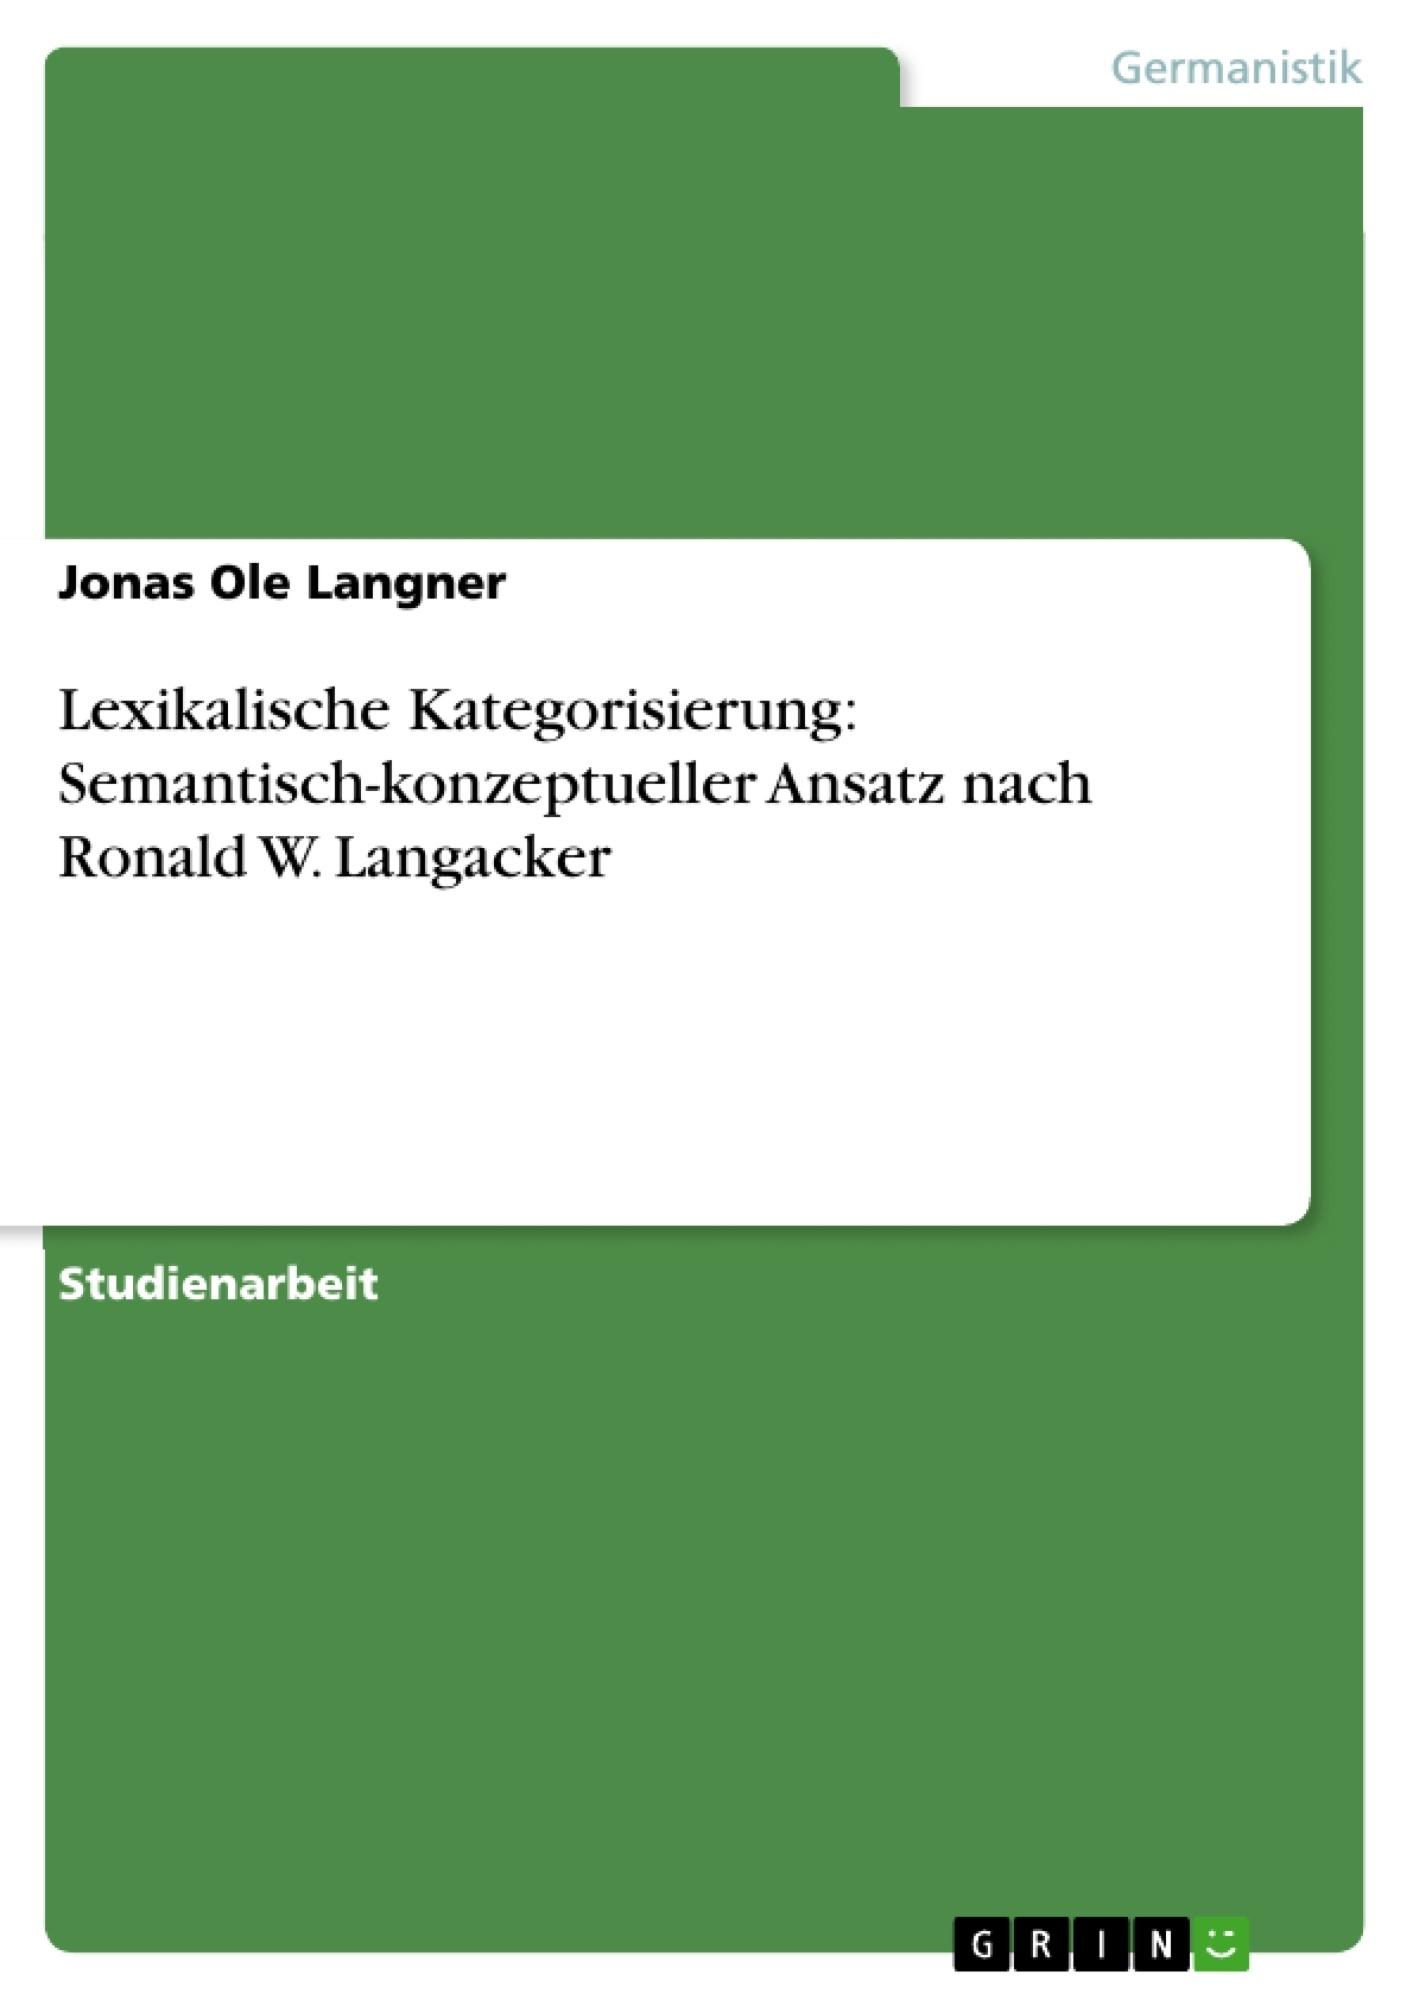 Titel: Lexikalische Kategorisierung: Semantisch-konzeptueller Ansatz nach Ronald W. Langacker